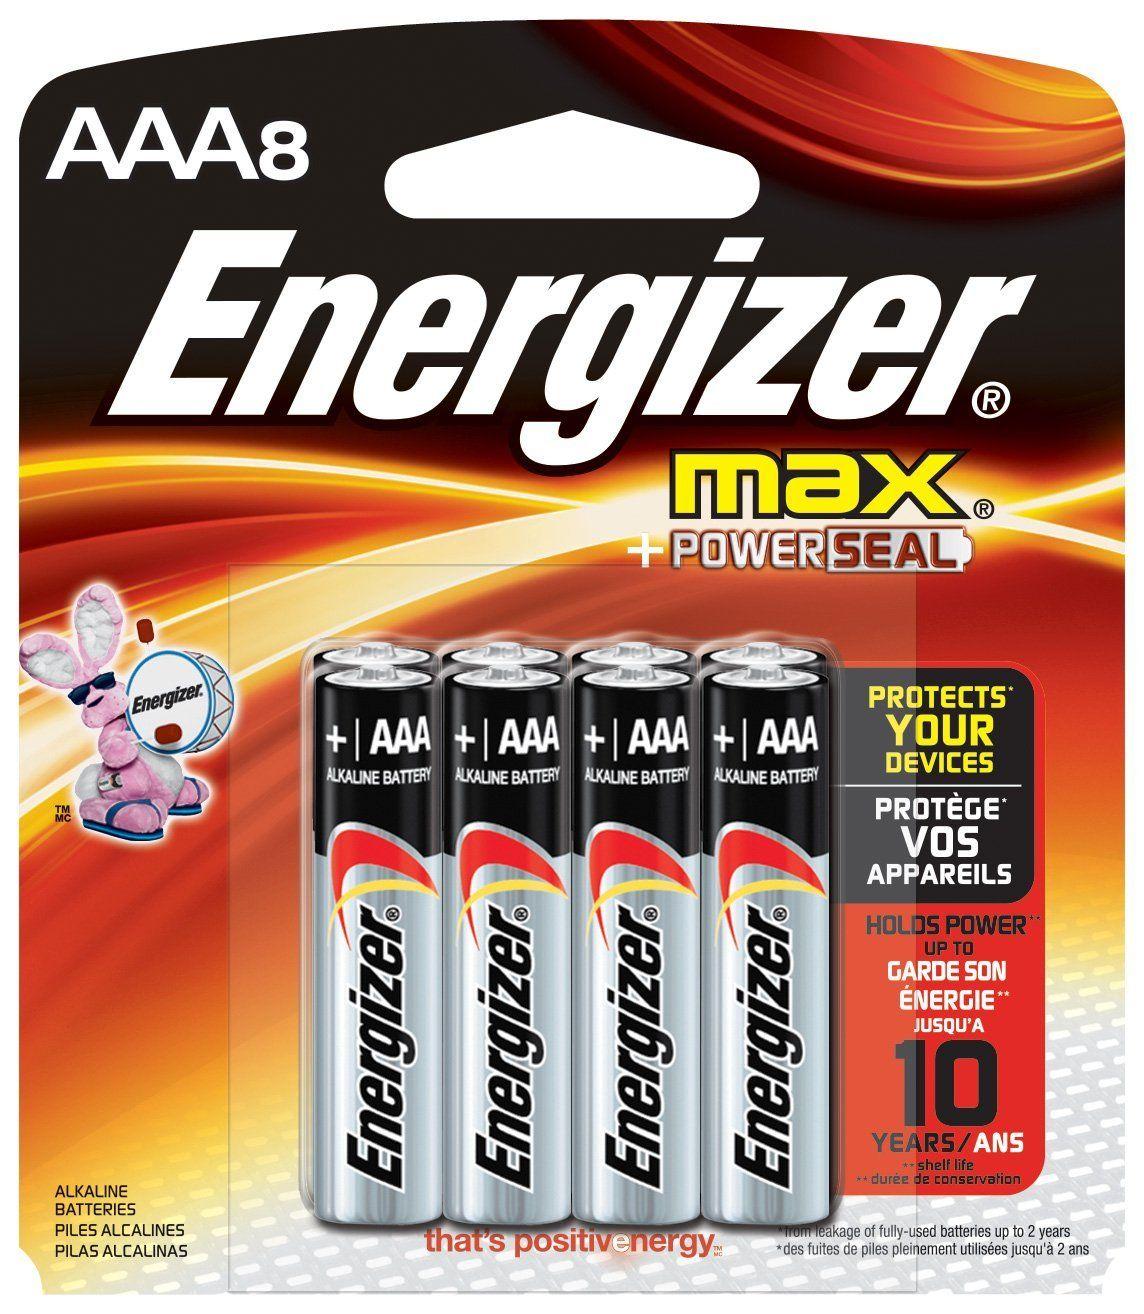 Energizer Max Alkaline Aaa Batteries 8 Ea Alkaline Max Energizer Ea Energizer Battery Energizer Aaa Batteries